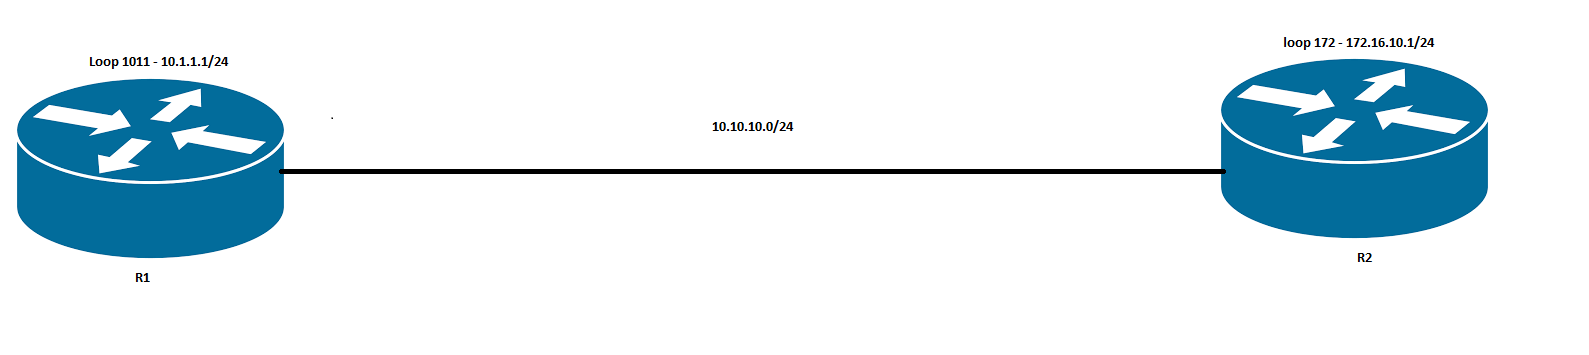 OSPF Adjacency